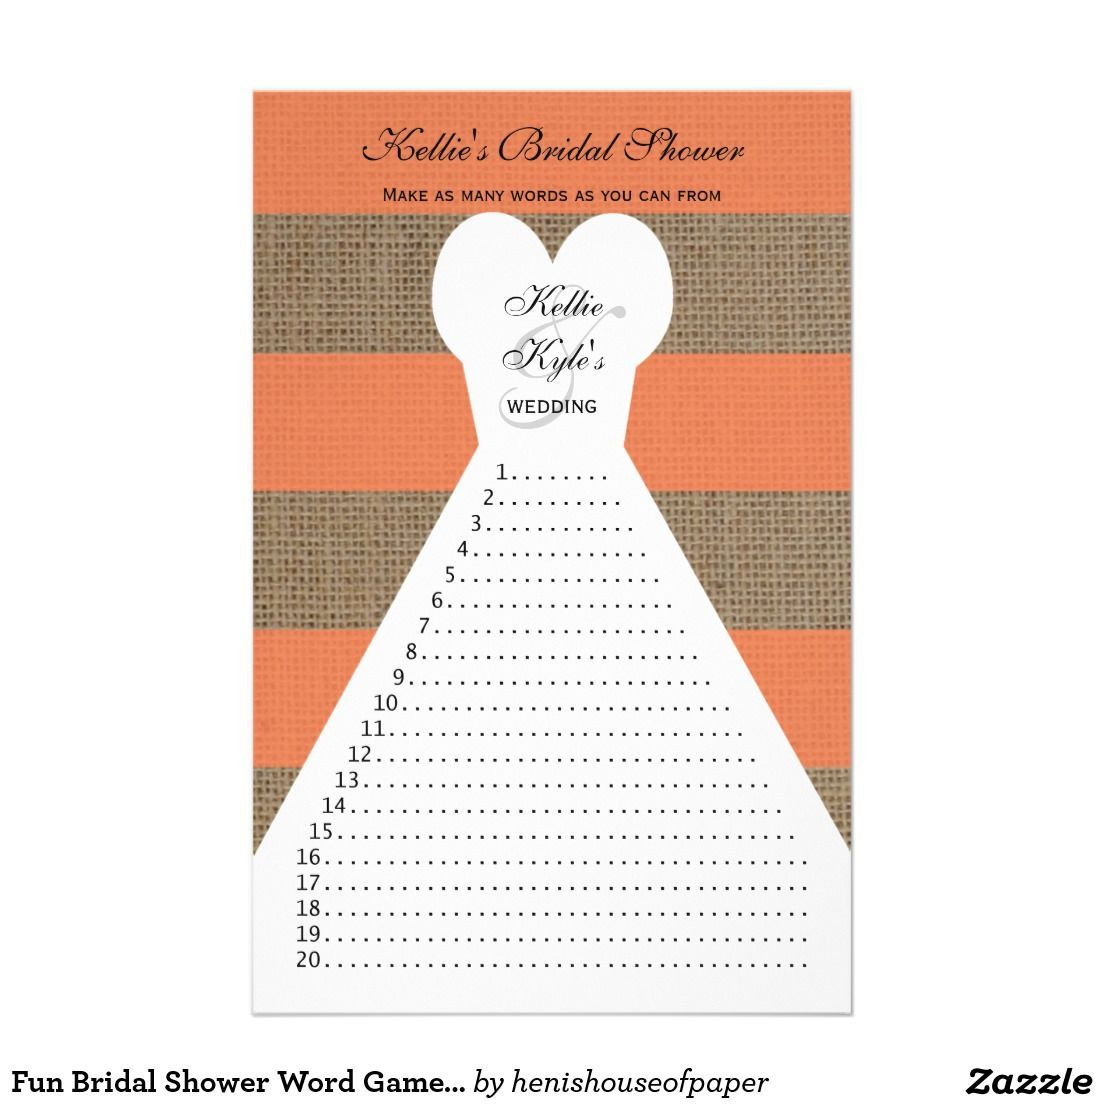 fun bridal shower word games coral flyer flyers fun and word fun bridal shower word games coral 5 5 x 8 5 flyer